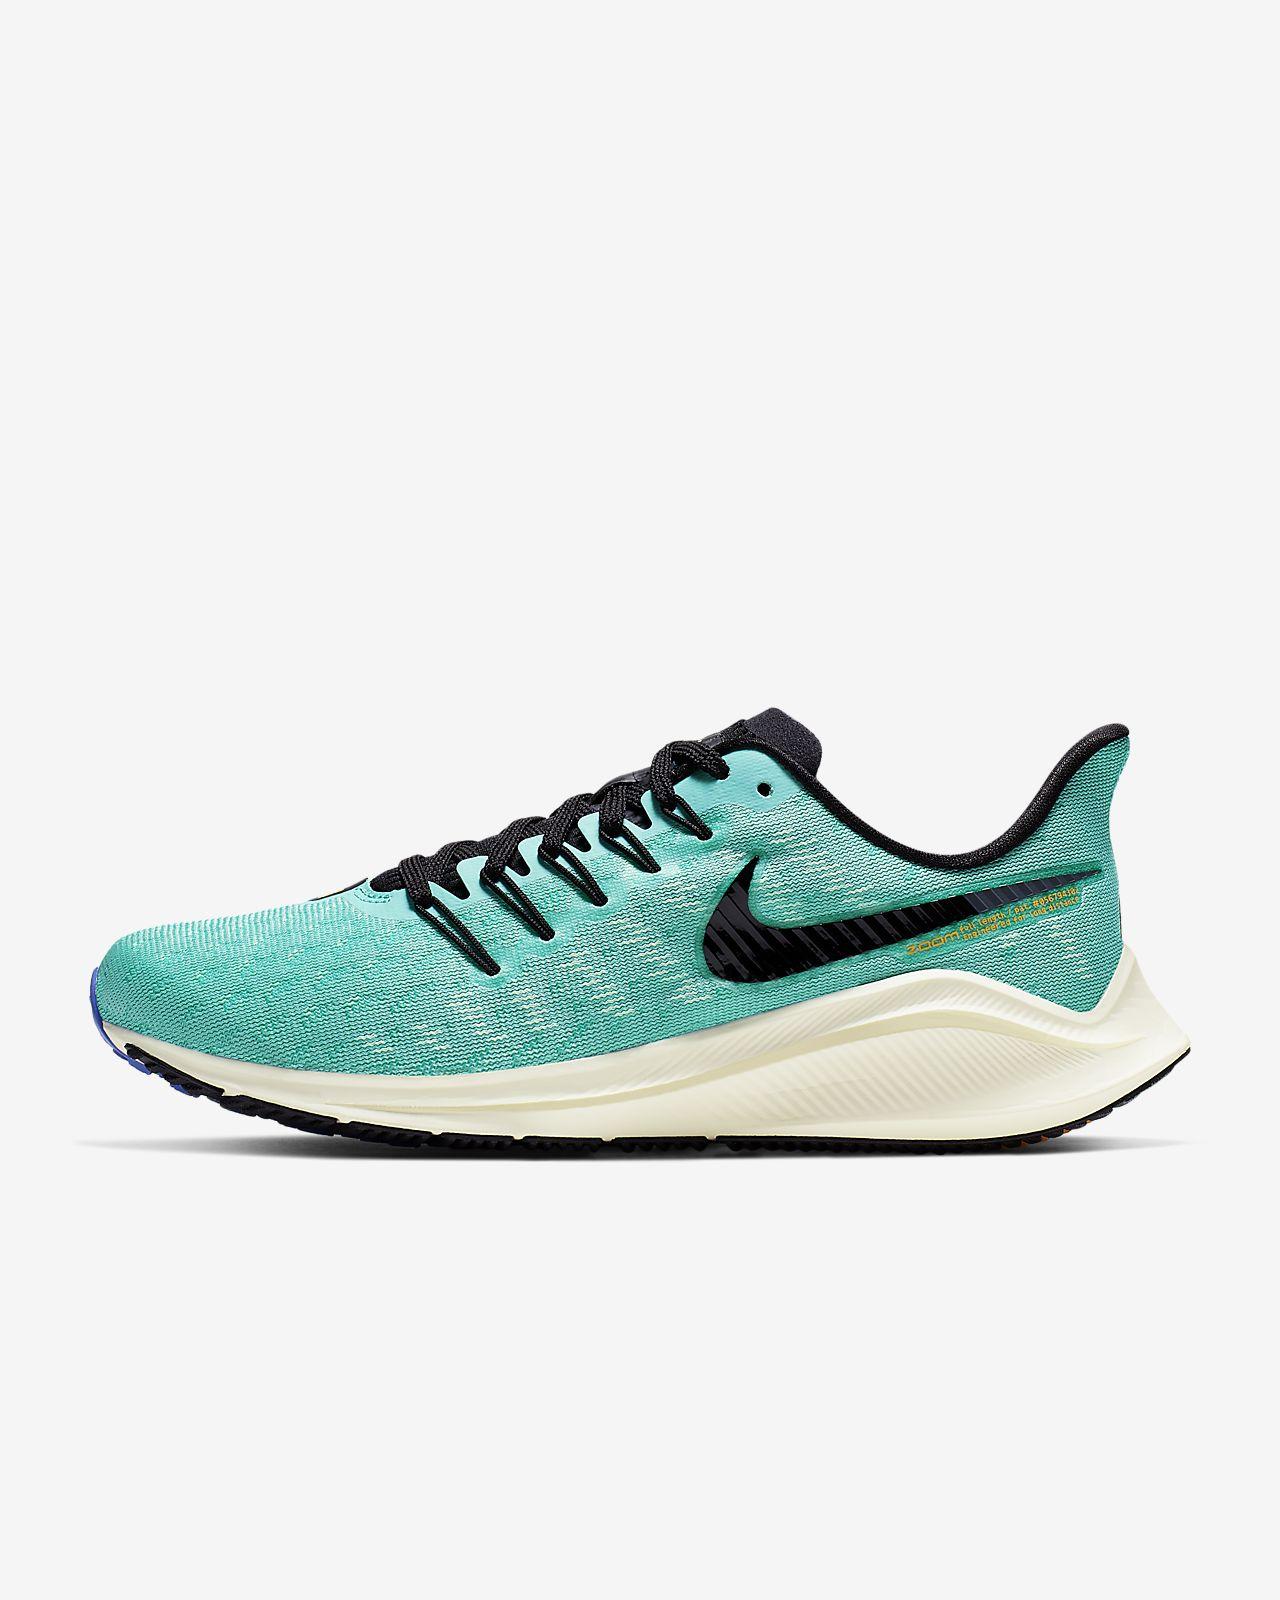 888cb34d2141 Nike Air Zoom Vomero 14 Women s Running Shoe. Nike.com DK